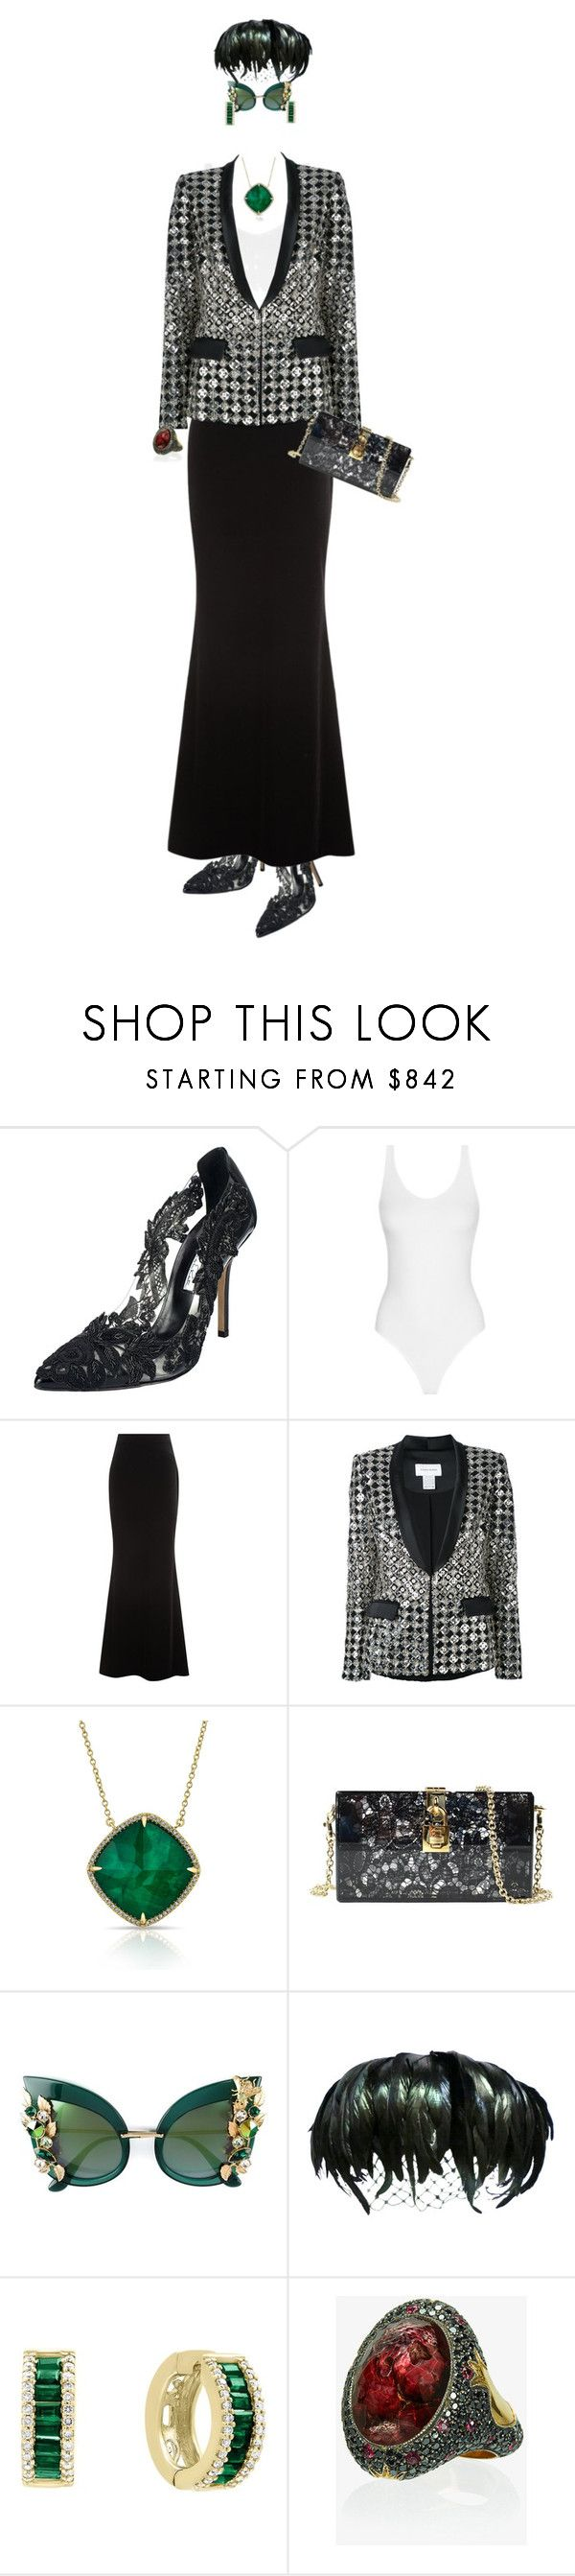 """The Velvet Evening Skirt."" by m-kints ❤ liked on Polyvore featuring Oscar de la Renta, Talbot Runhof, Zuhair Murad, Dolce&Gabbana, Bloomingdale's, Sevan Biçakçi and invisibledolls"